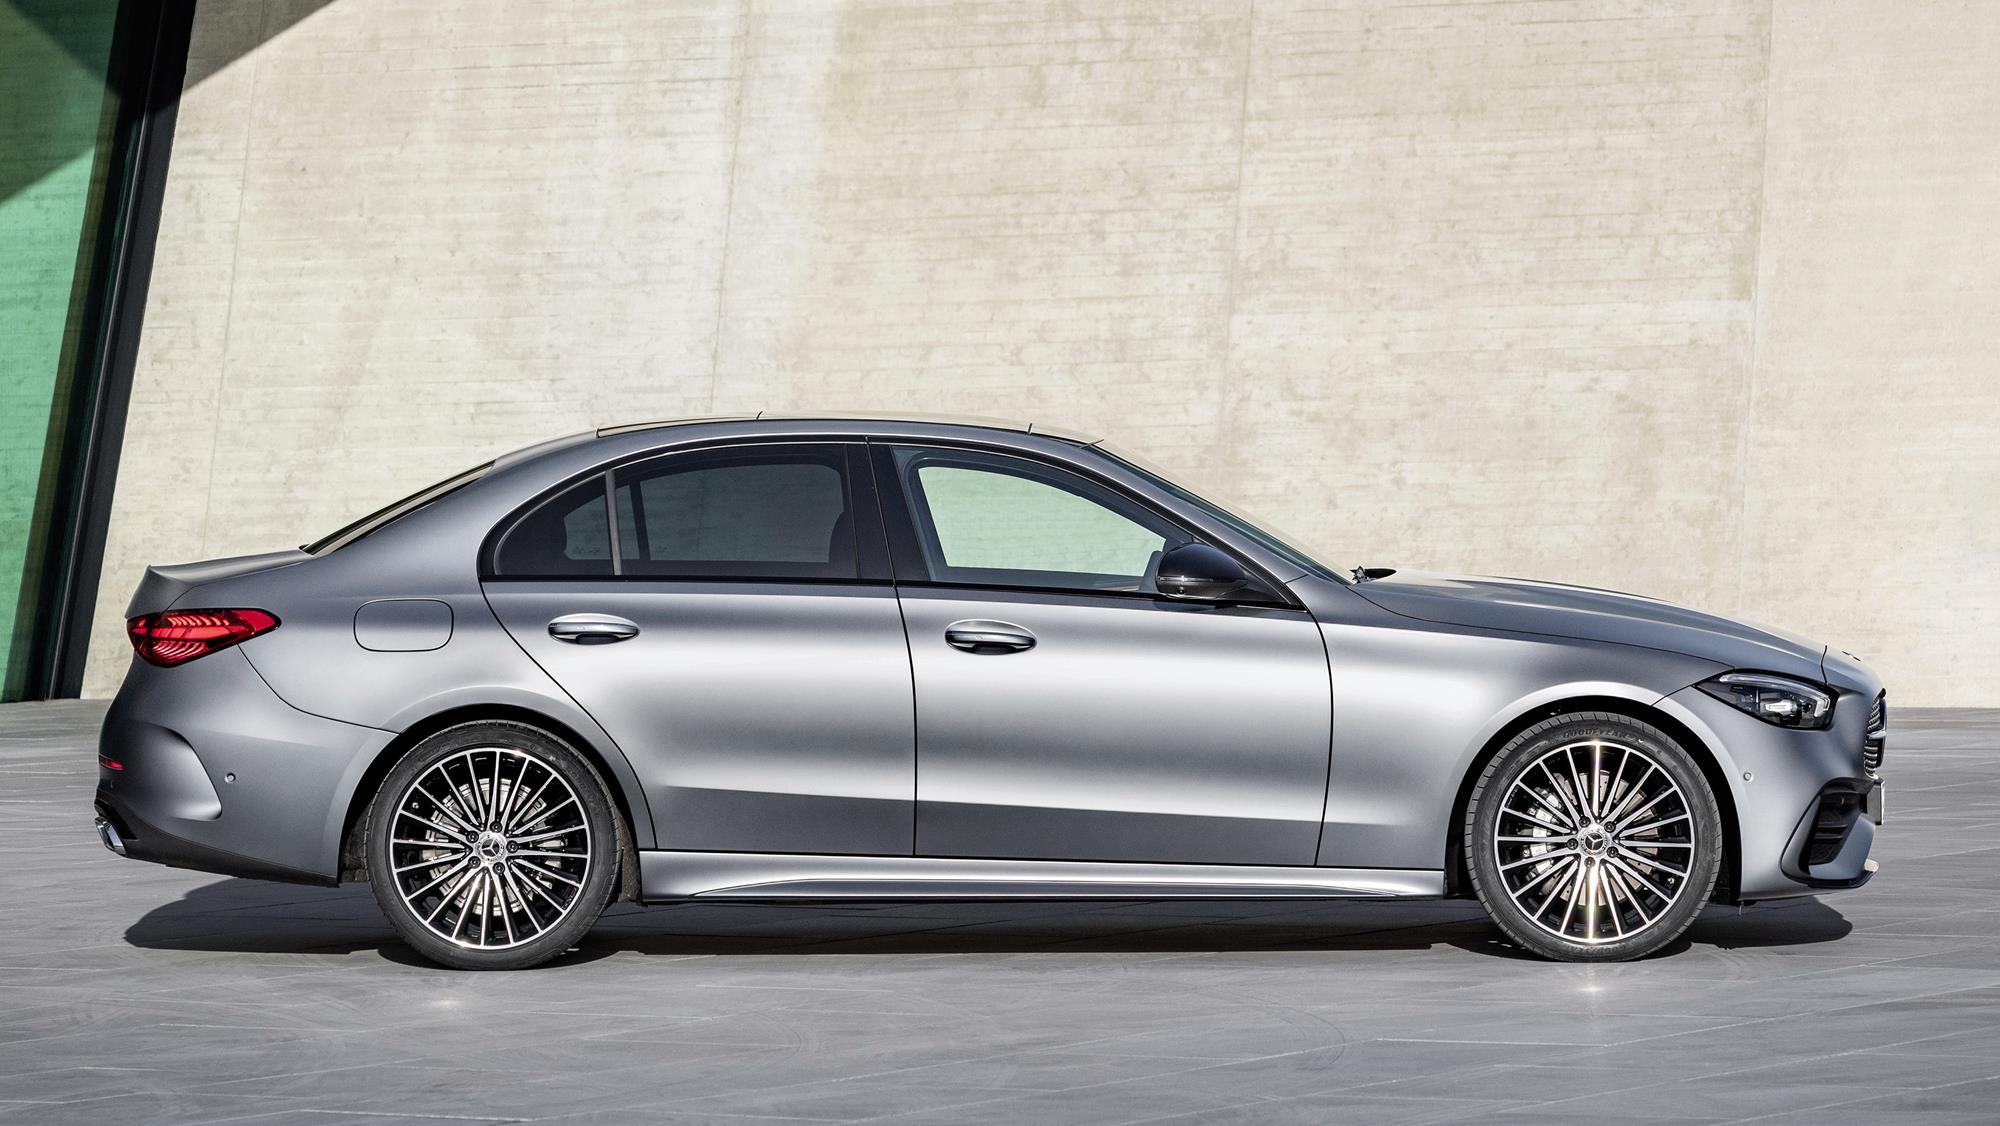 Mercedes-Benz-Classe-C-2022-17.jpg